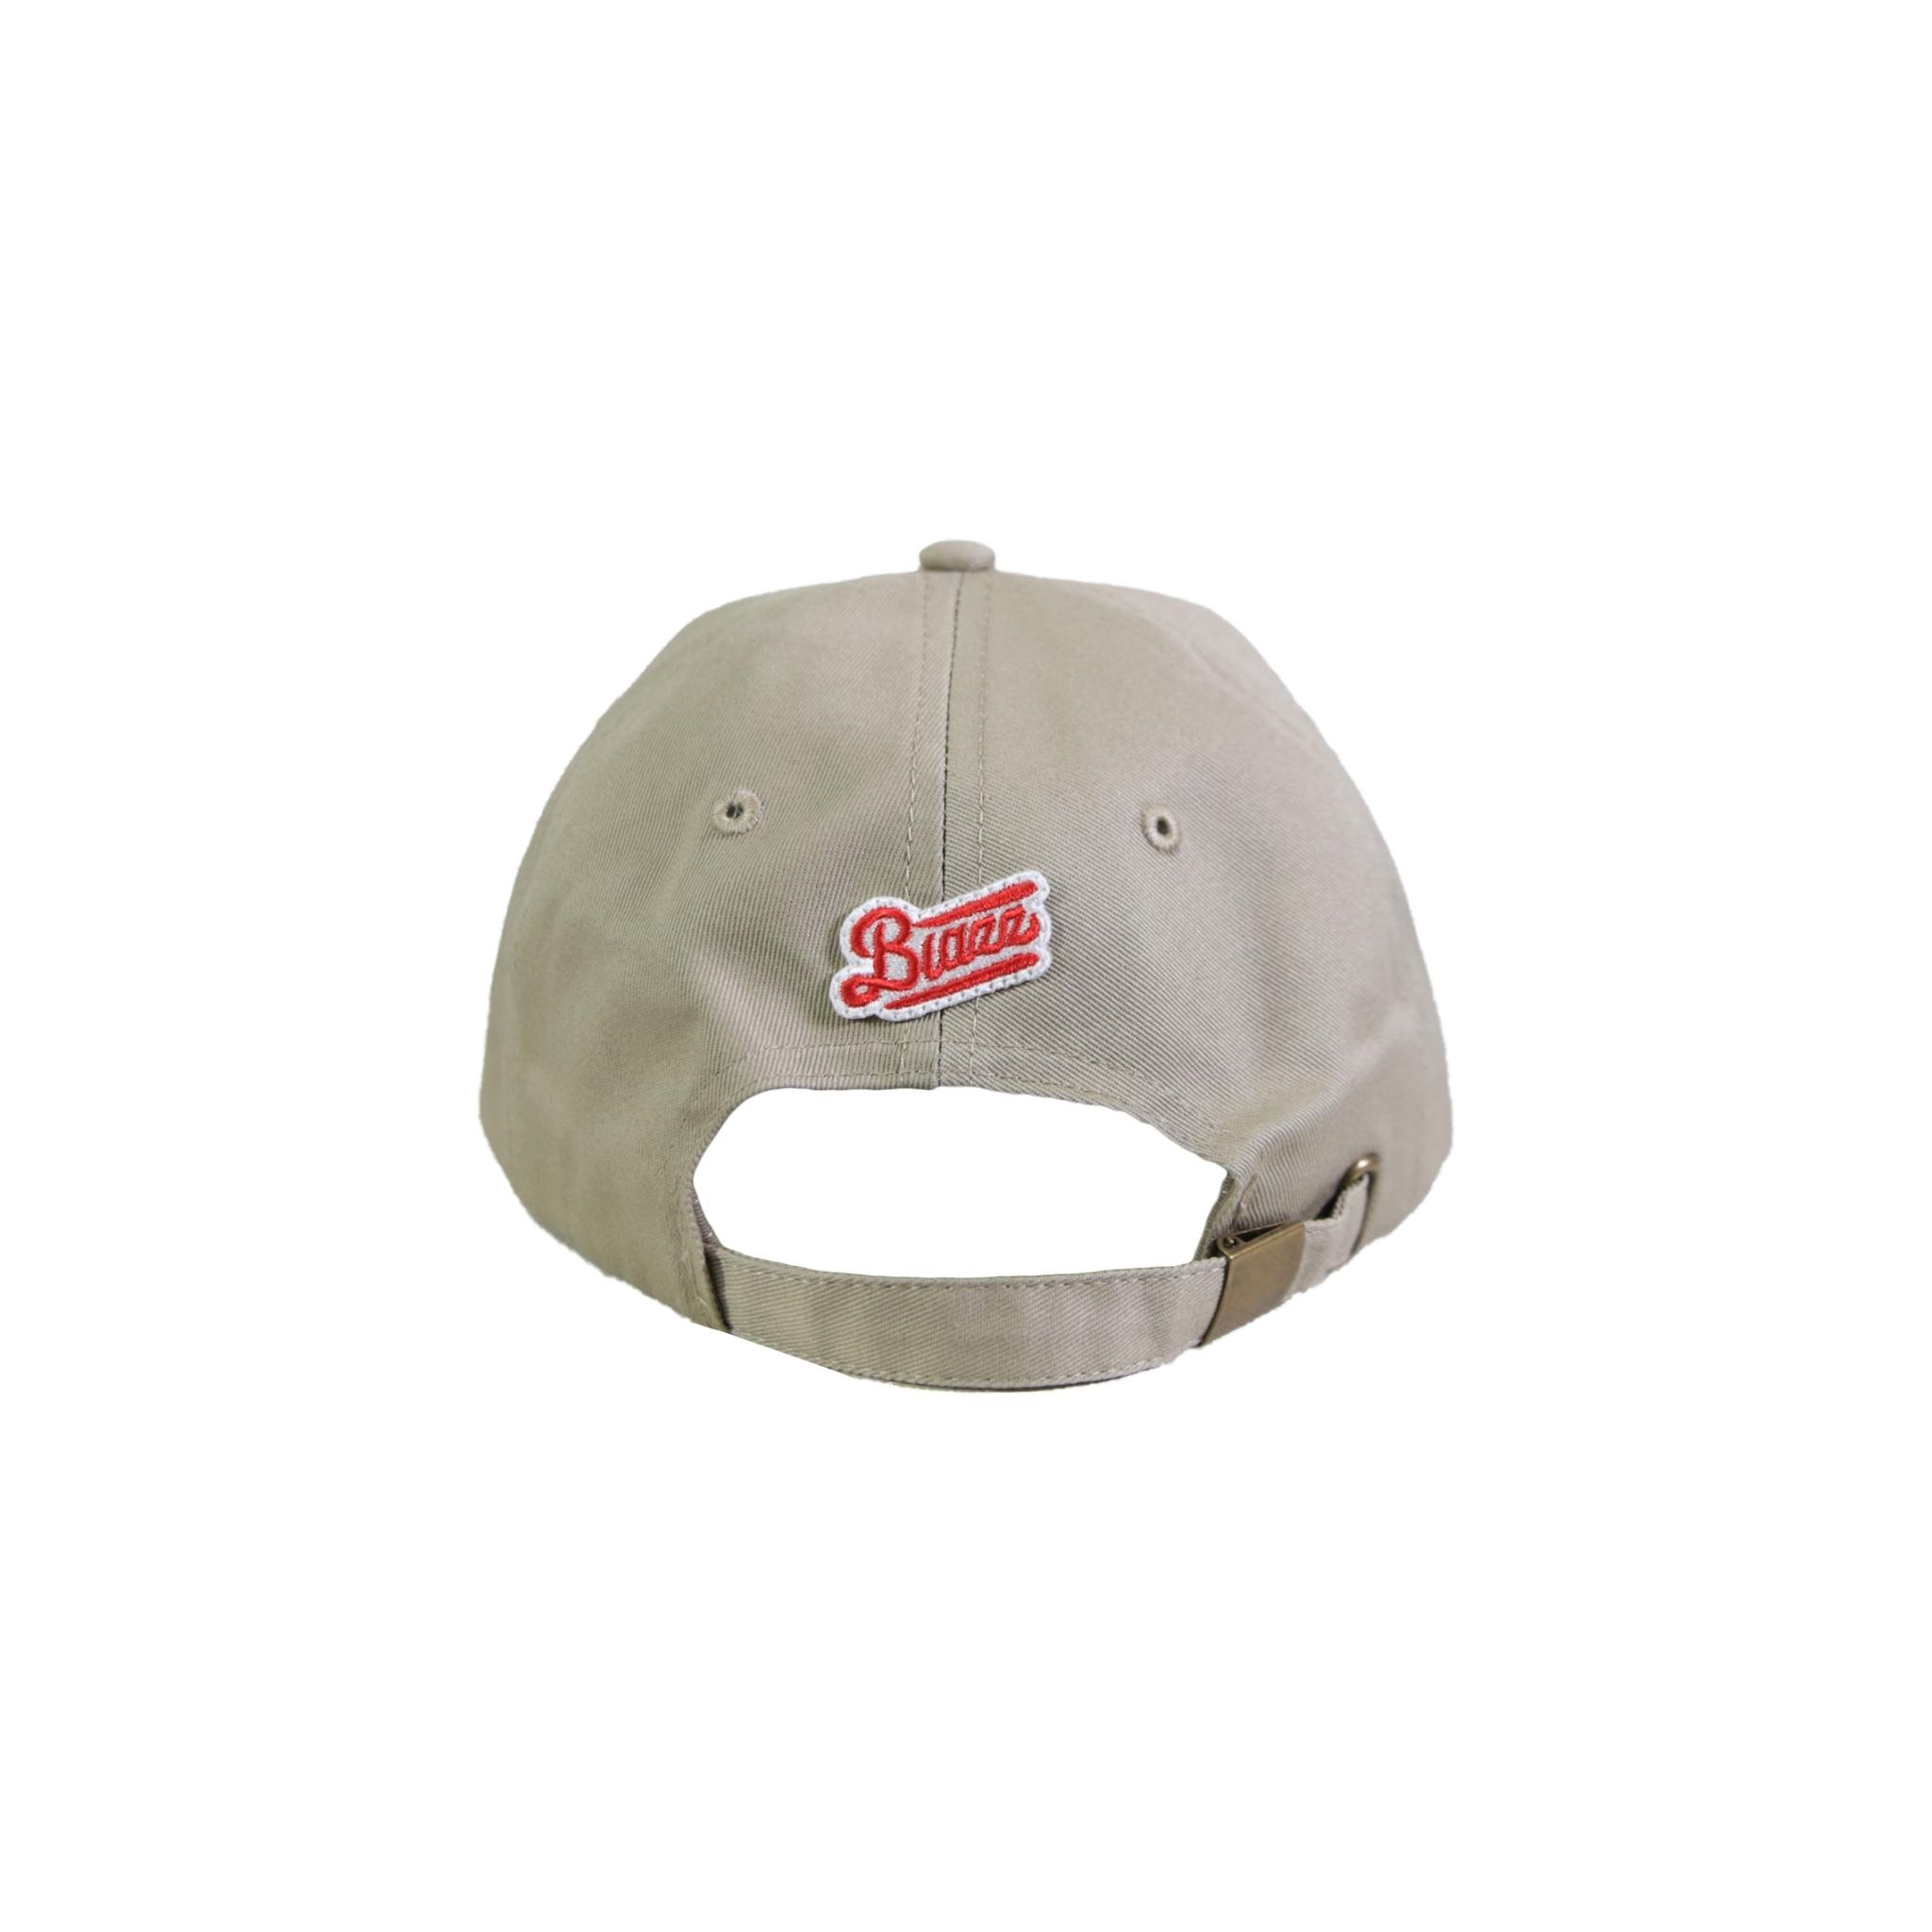 MINI LOGO COTTON CAP [SAND x RED]